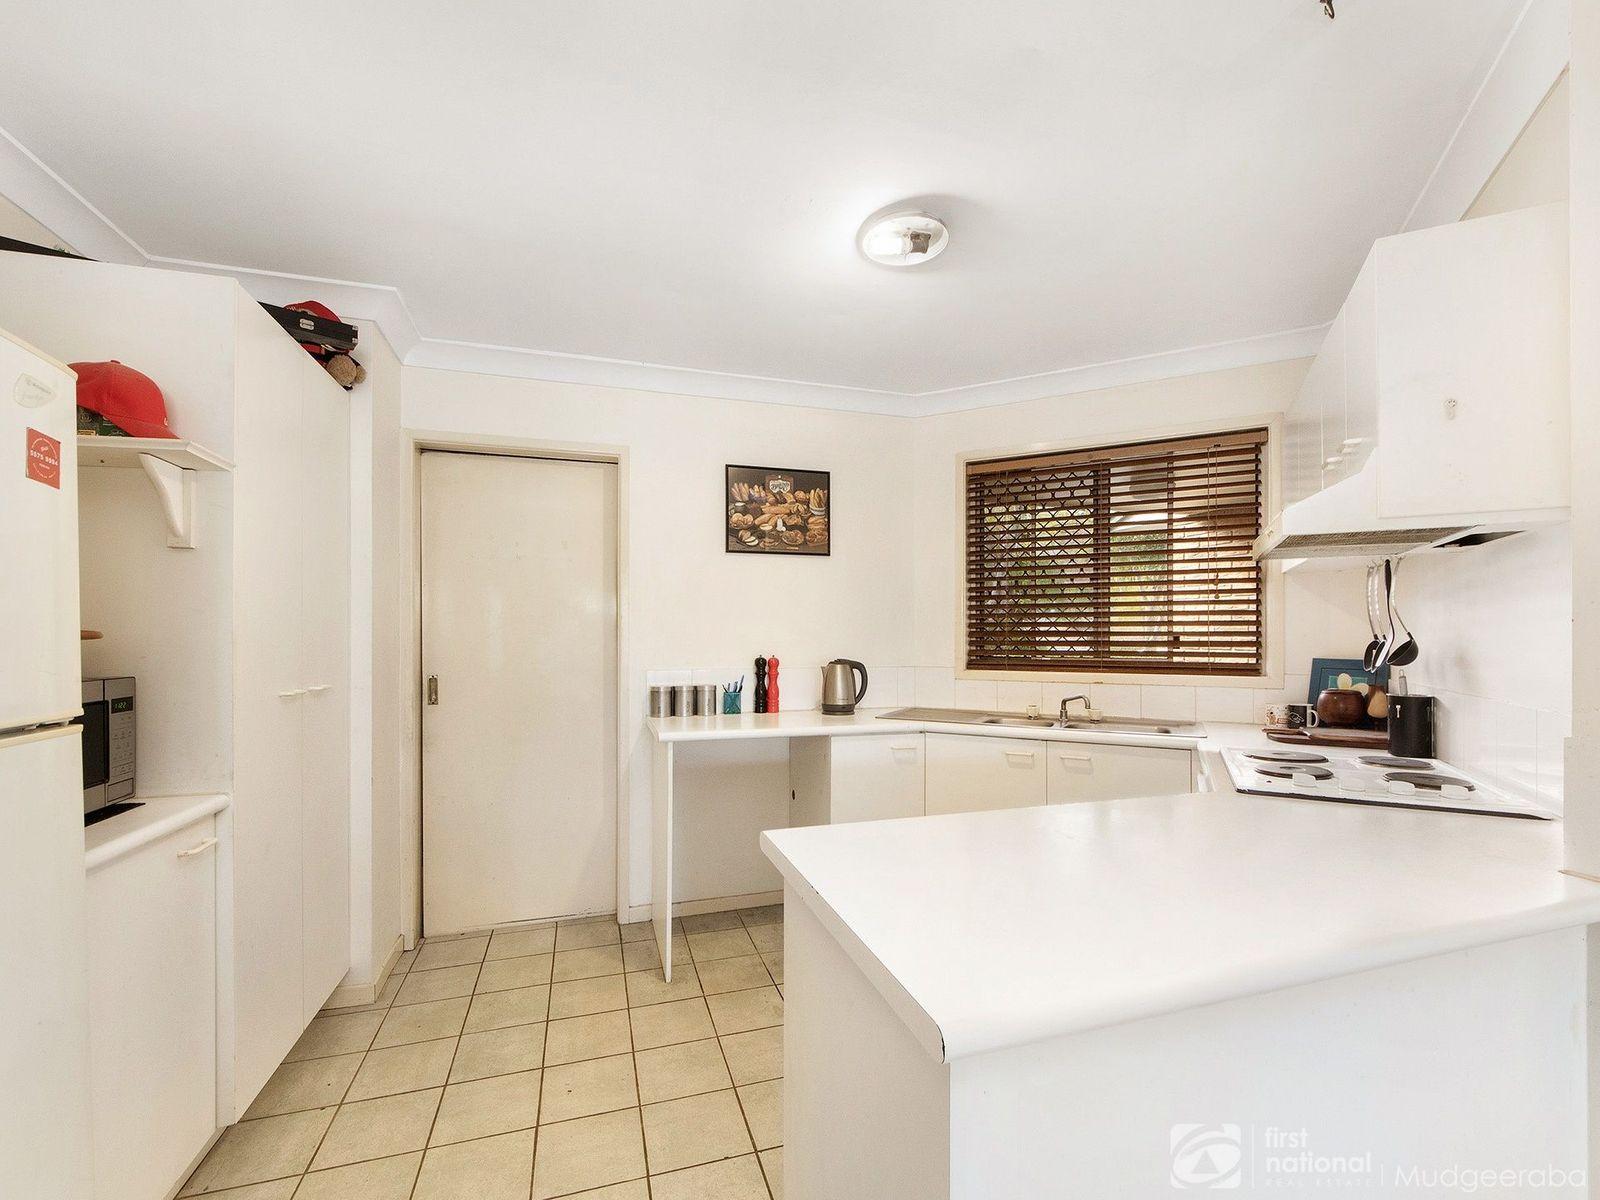 19/14 Bourton Road, Merrimac, QLD 4226